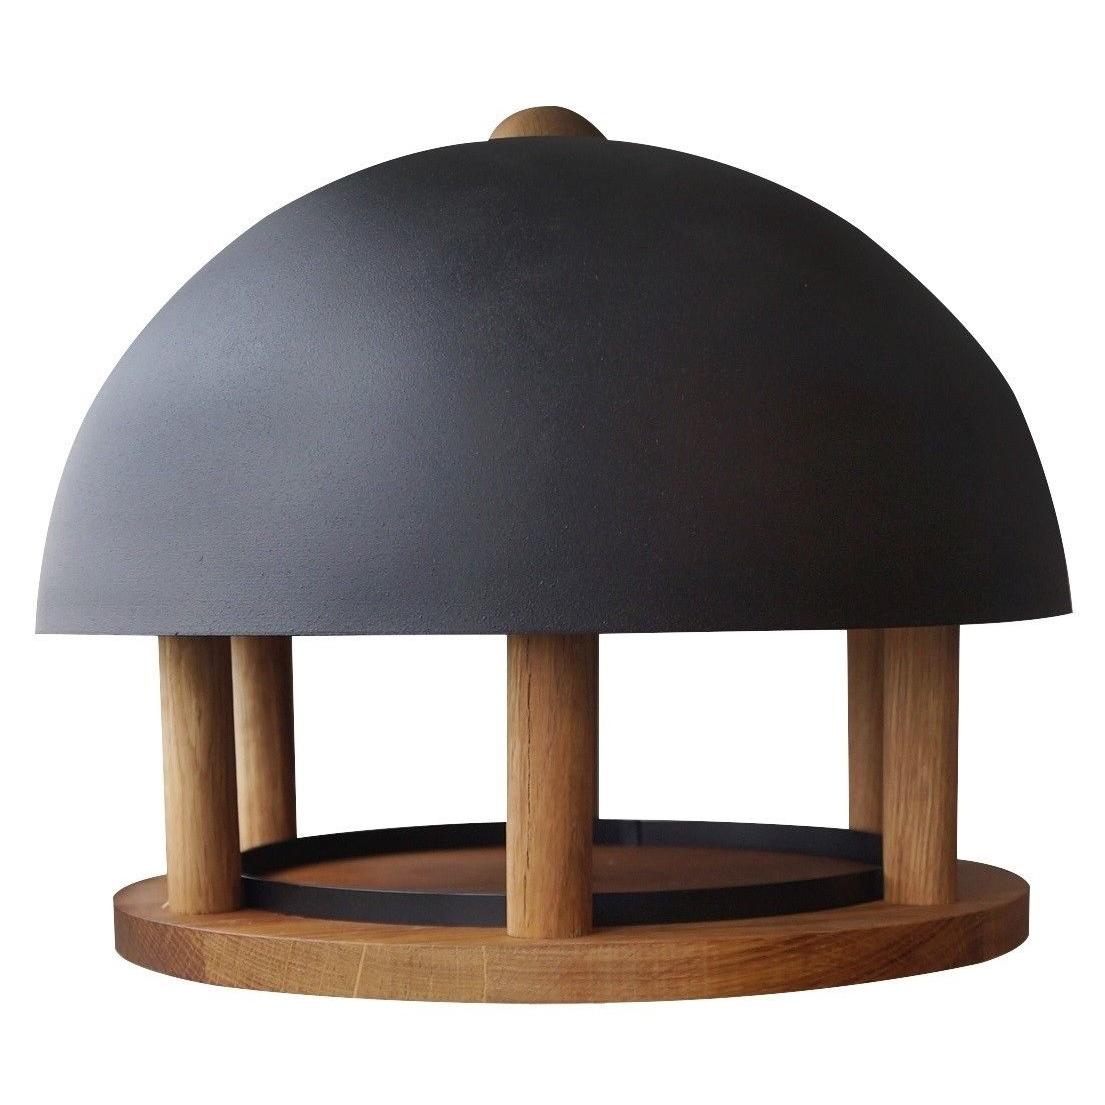 GARDENLIFE Garden Life Vogelhaus Dome Oak